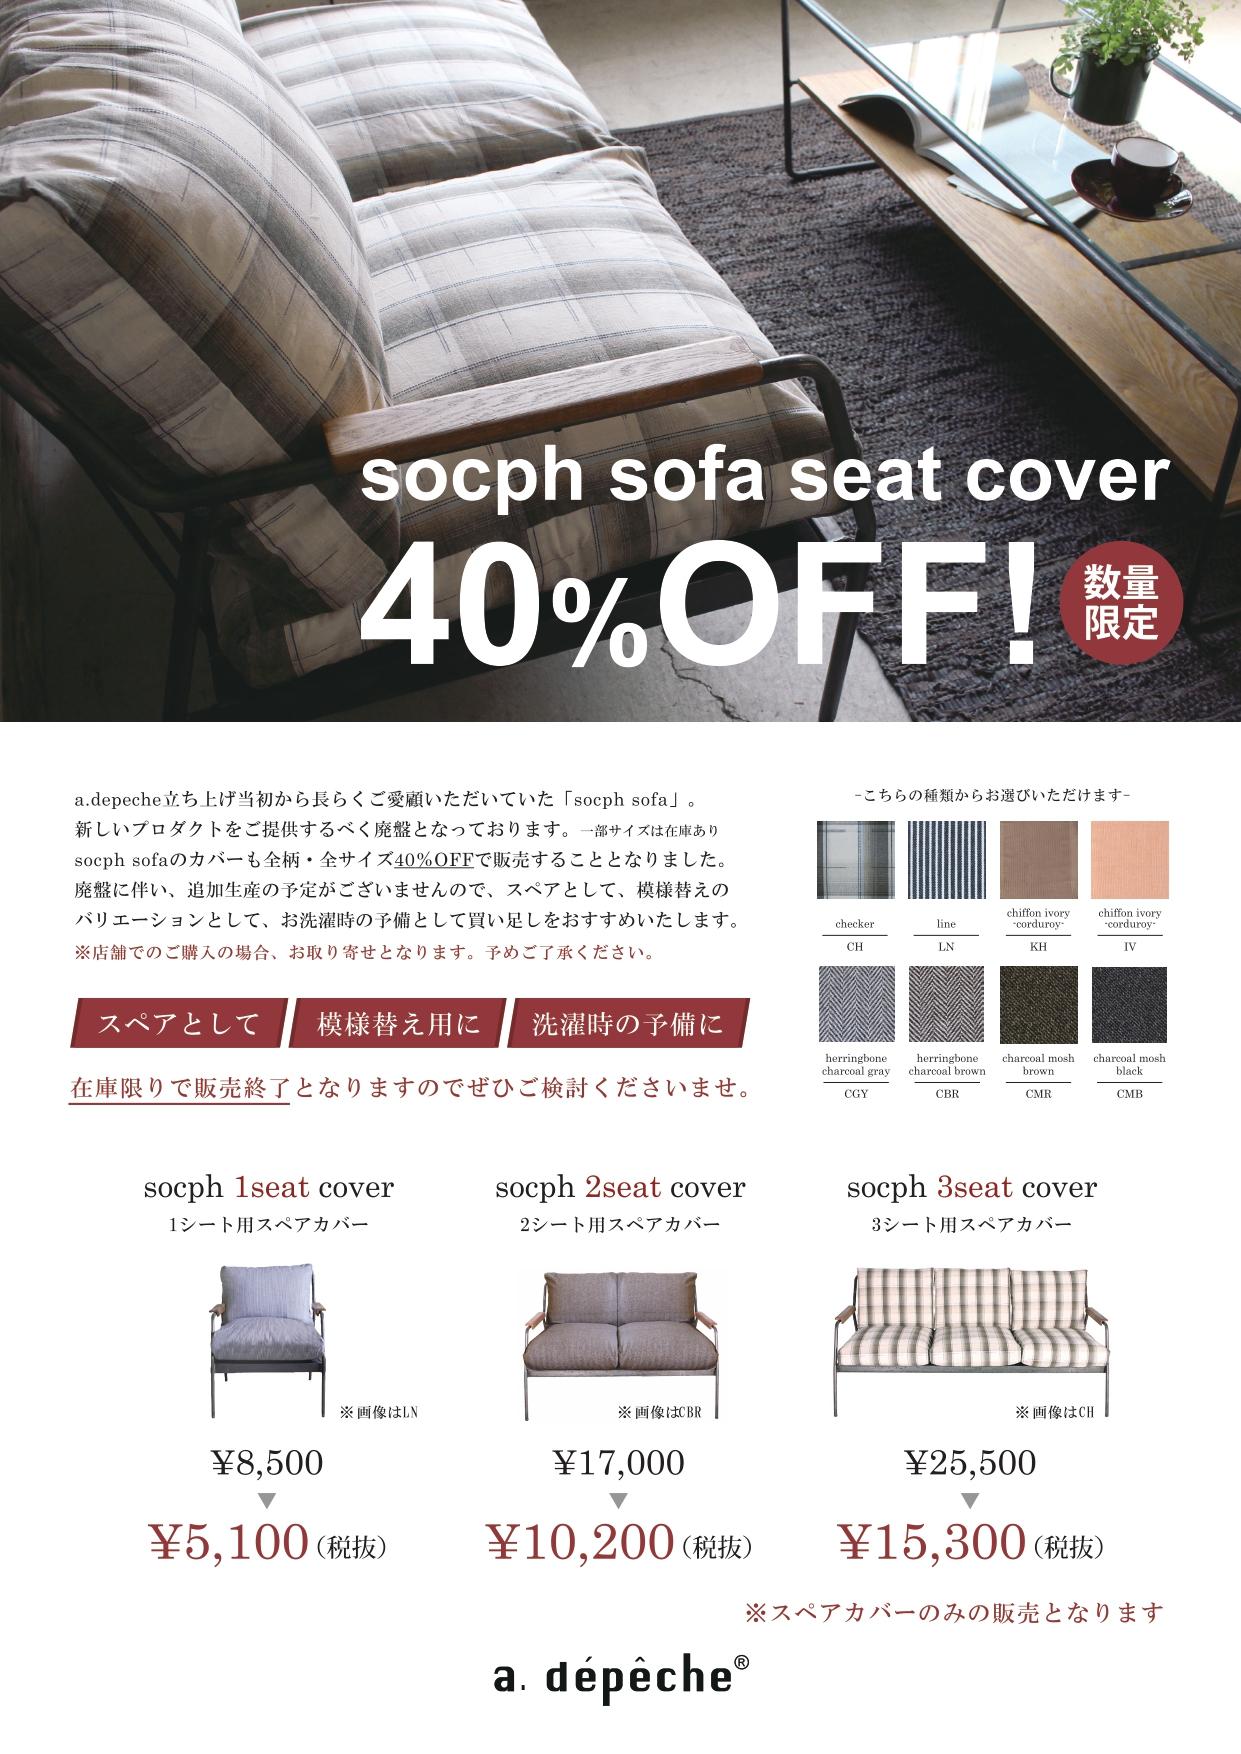 socph sofa cover special price販売のご案内